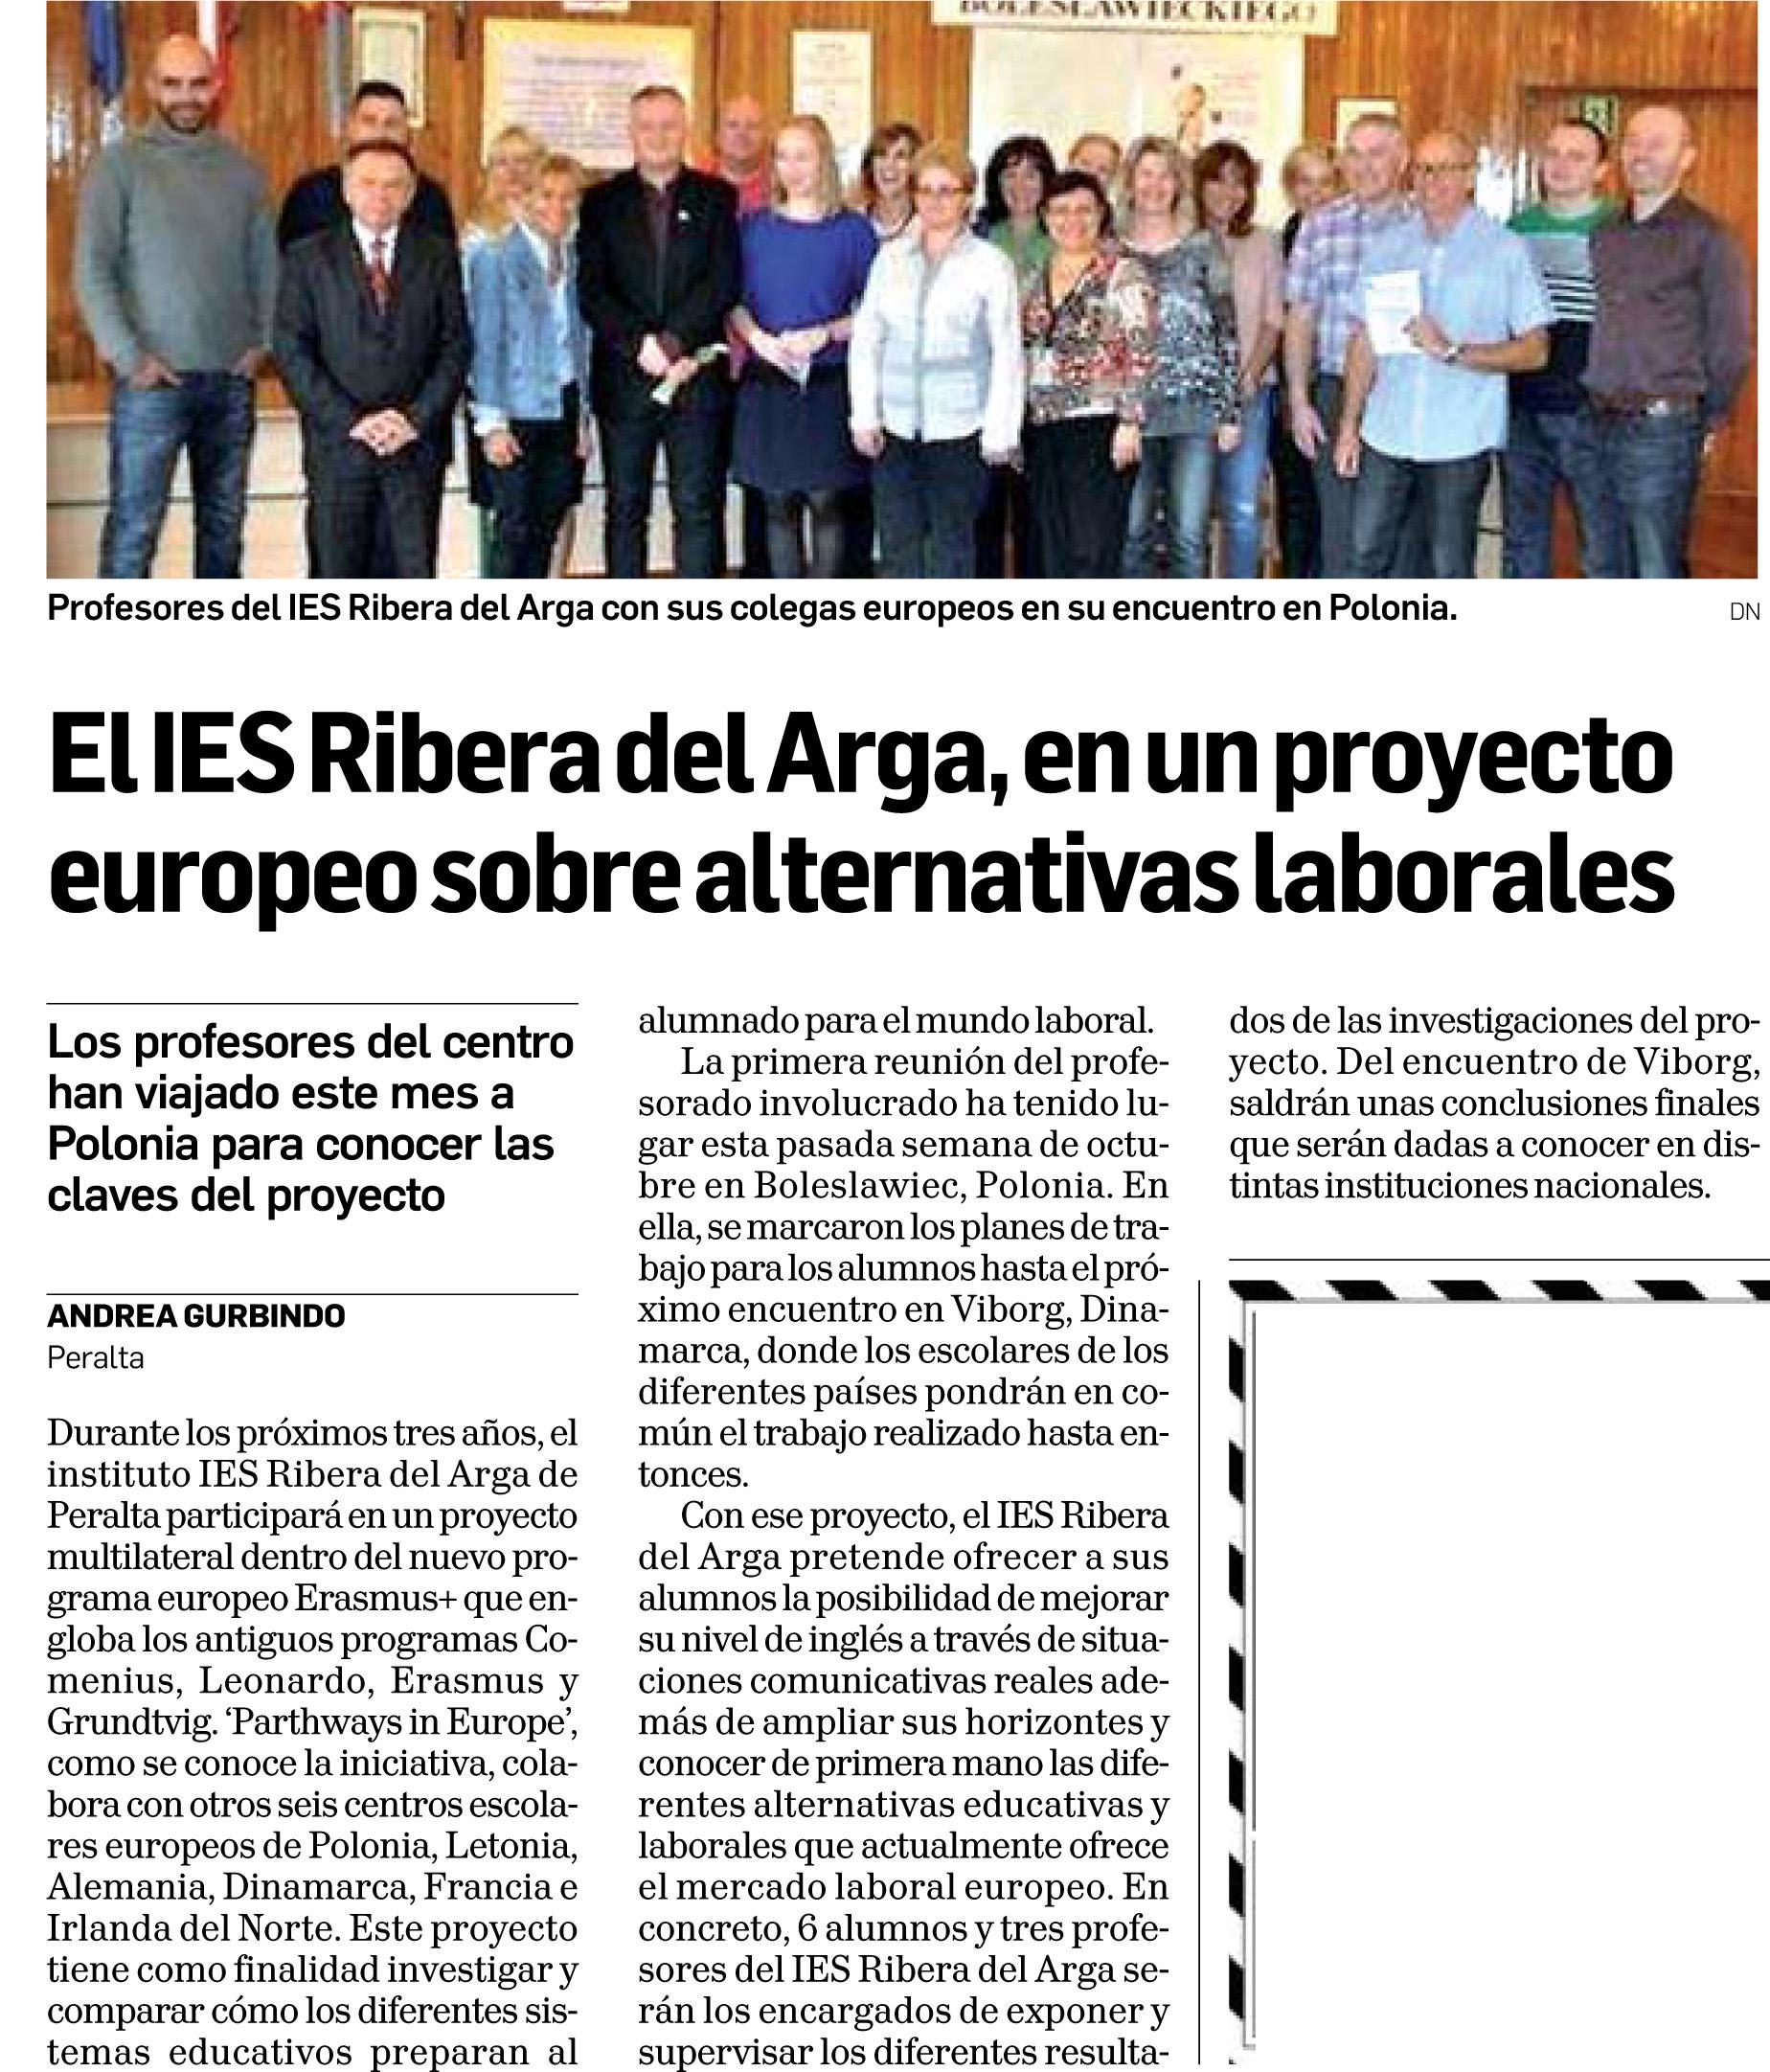 20141015 - Diario de Navarra - Tafalla - pag 35